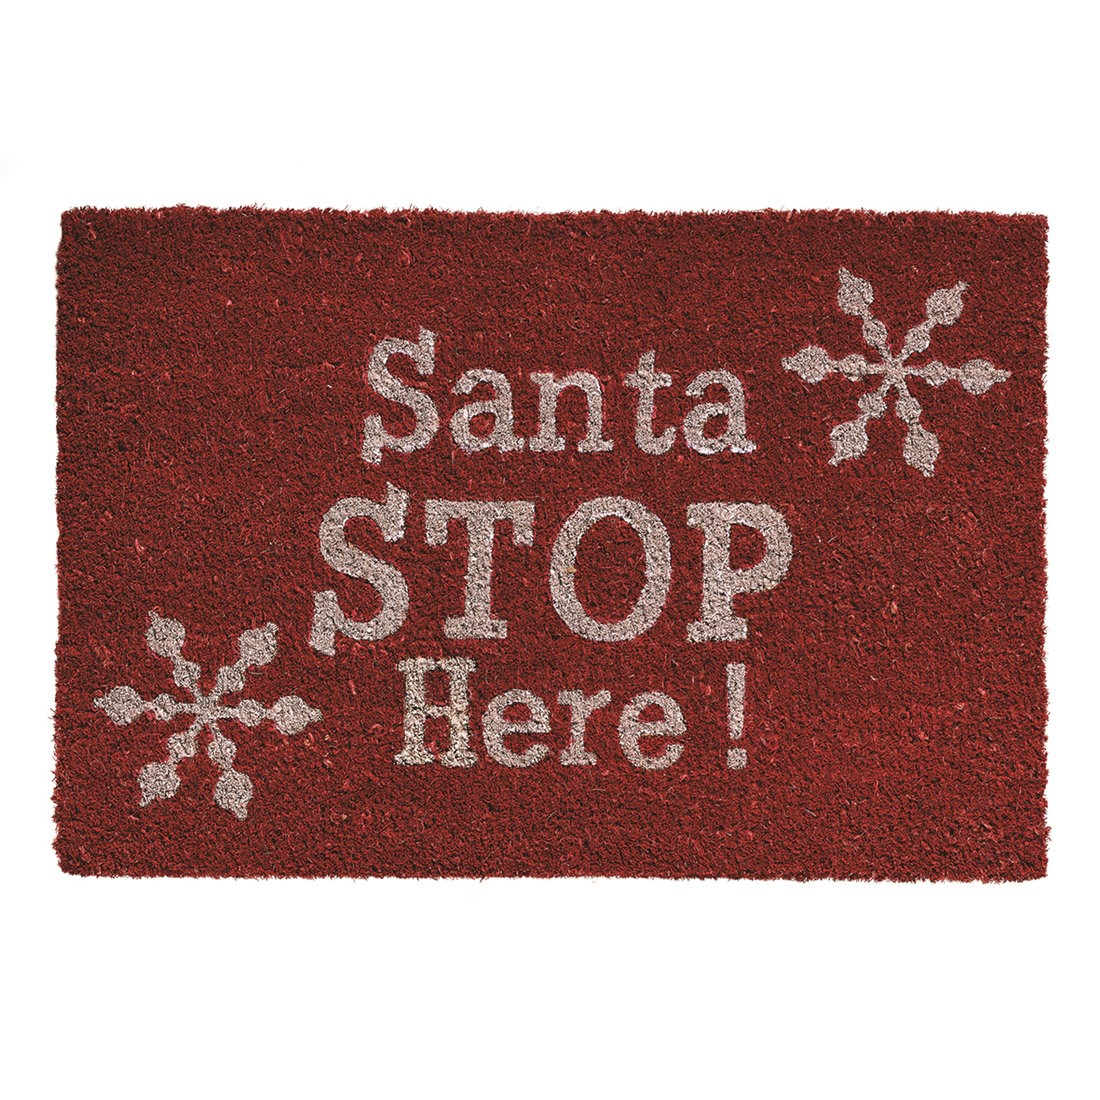 Festive Red SANTA STOP HERE Christmas Doormat